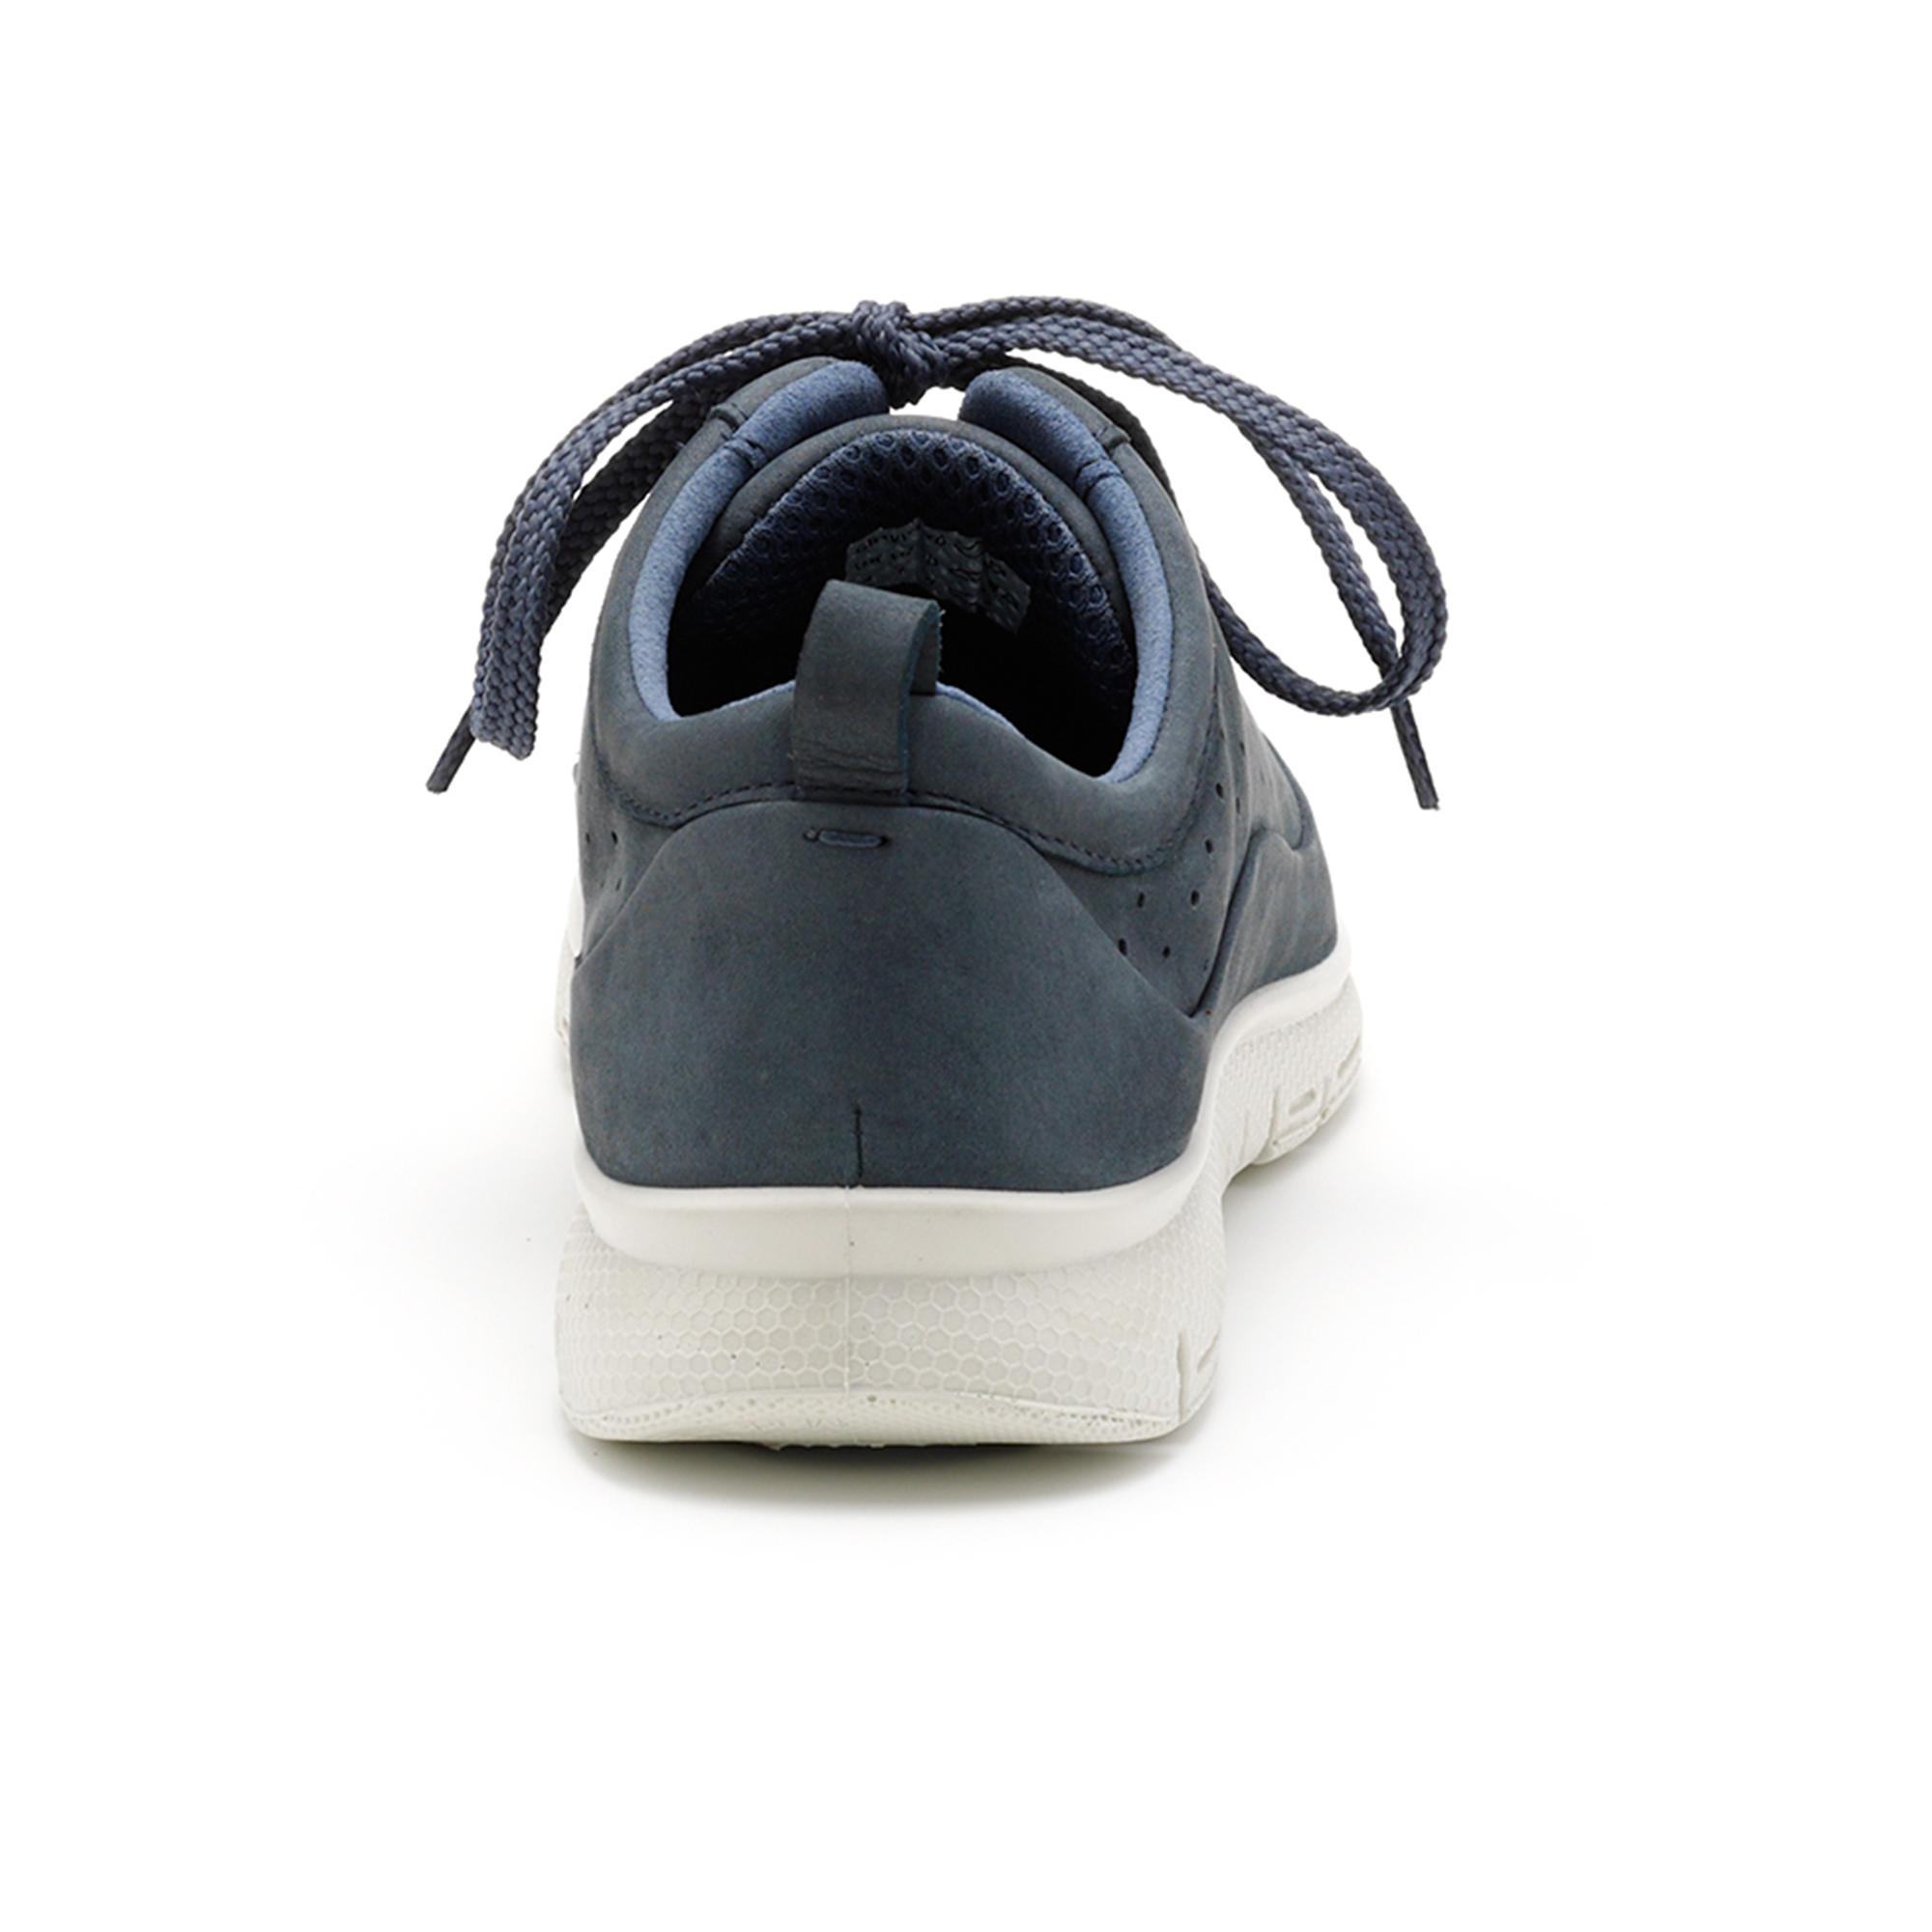 Hotter-Mujer-Gravity-Senoras-Activo-Zapatos-Calzado-Zapatillas-Cuero-Textil